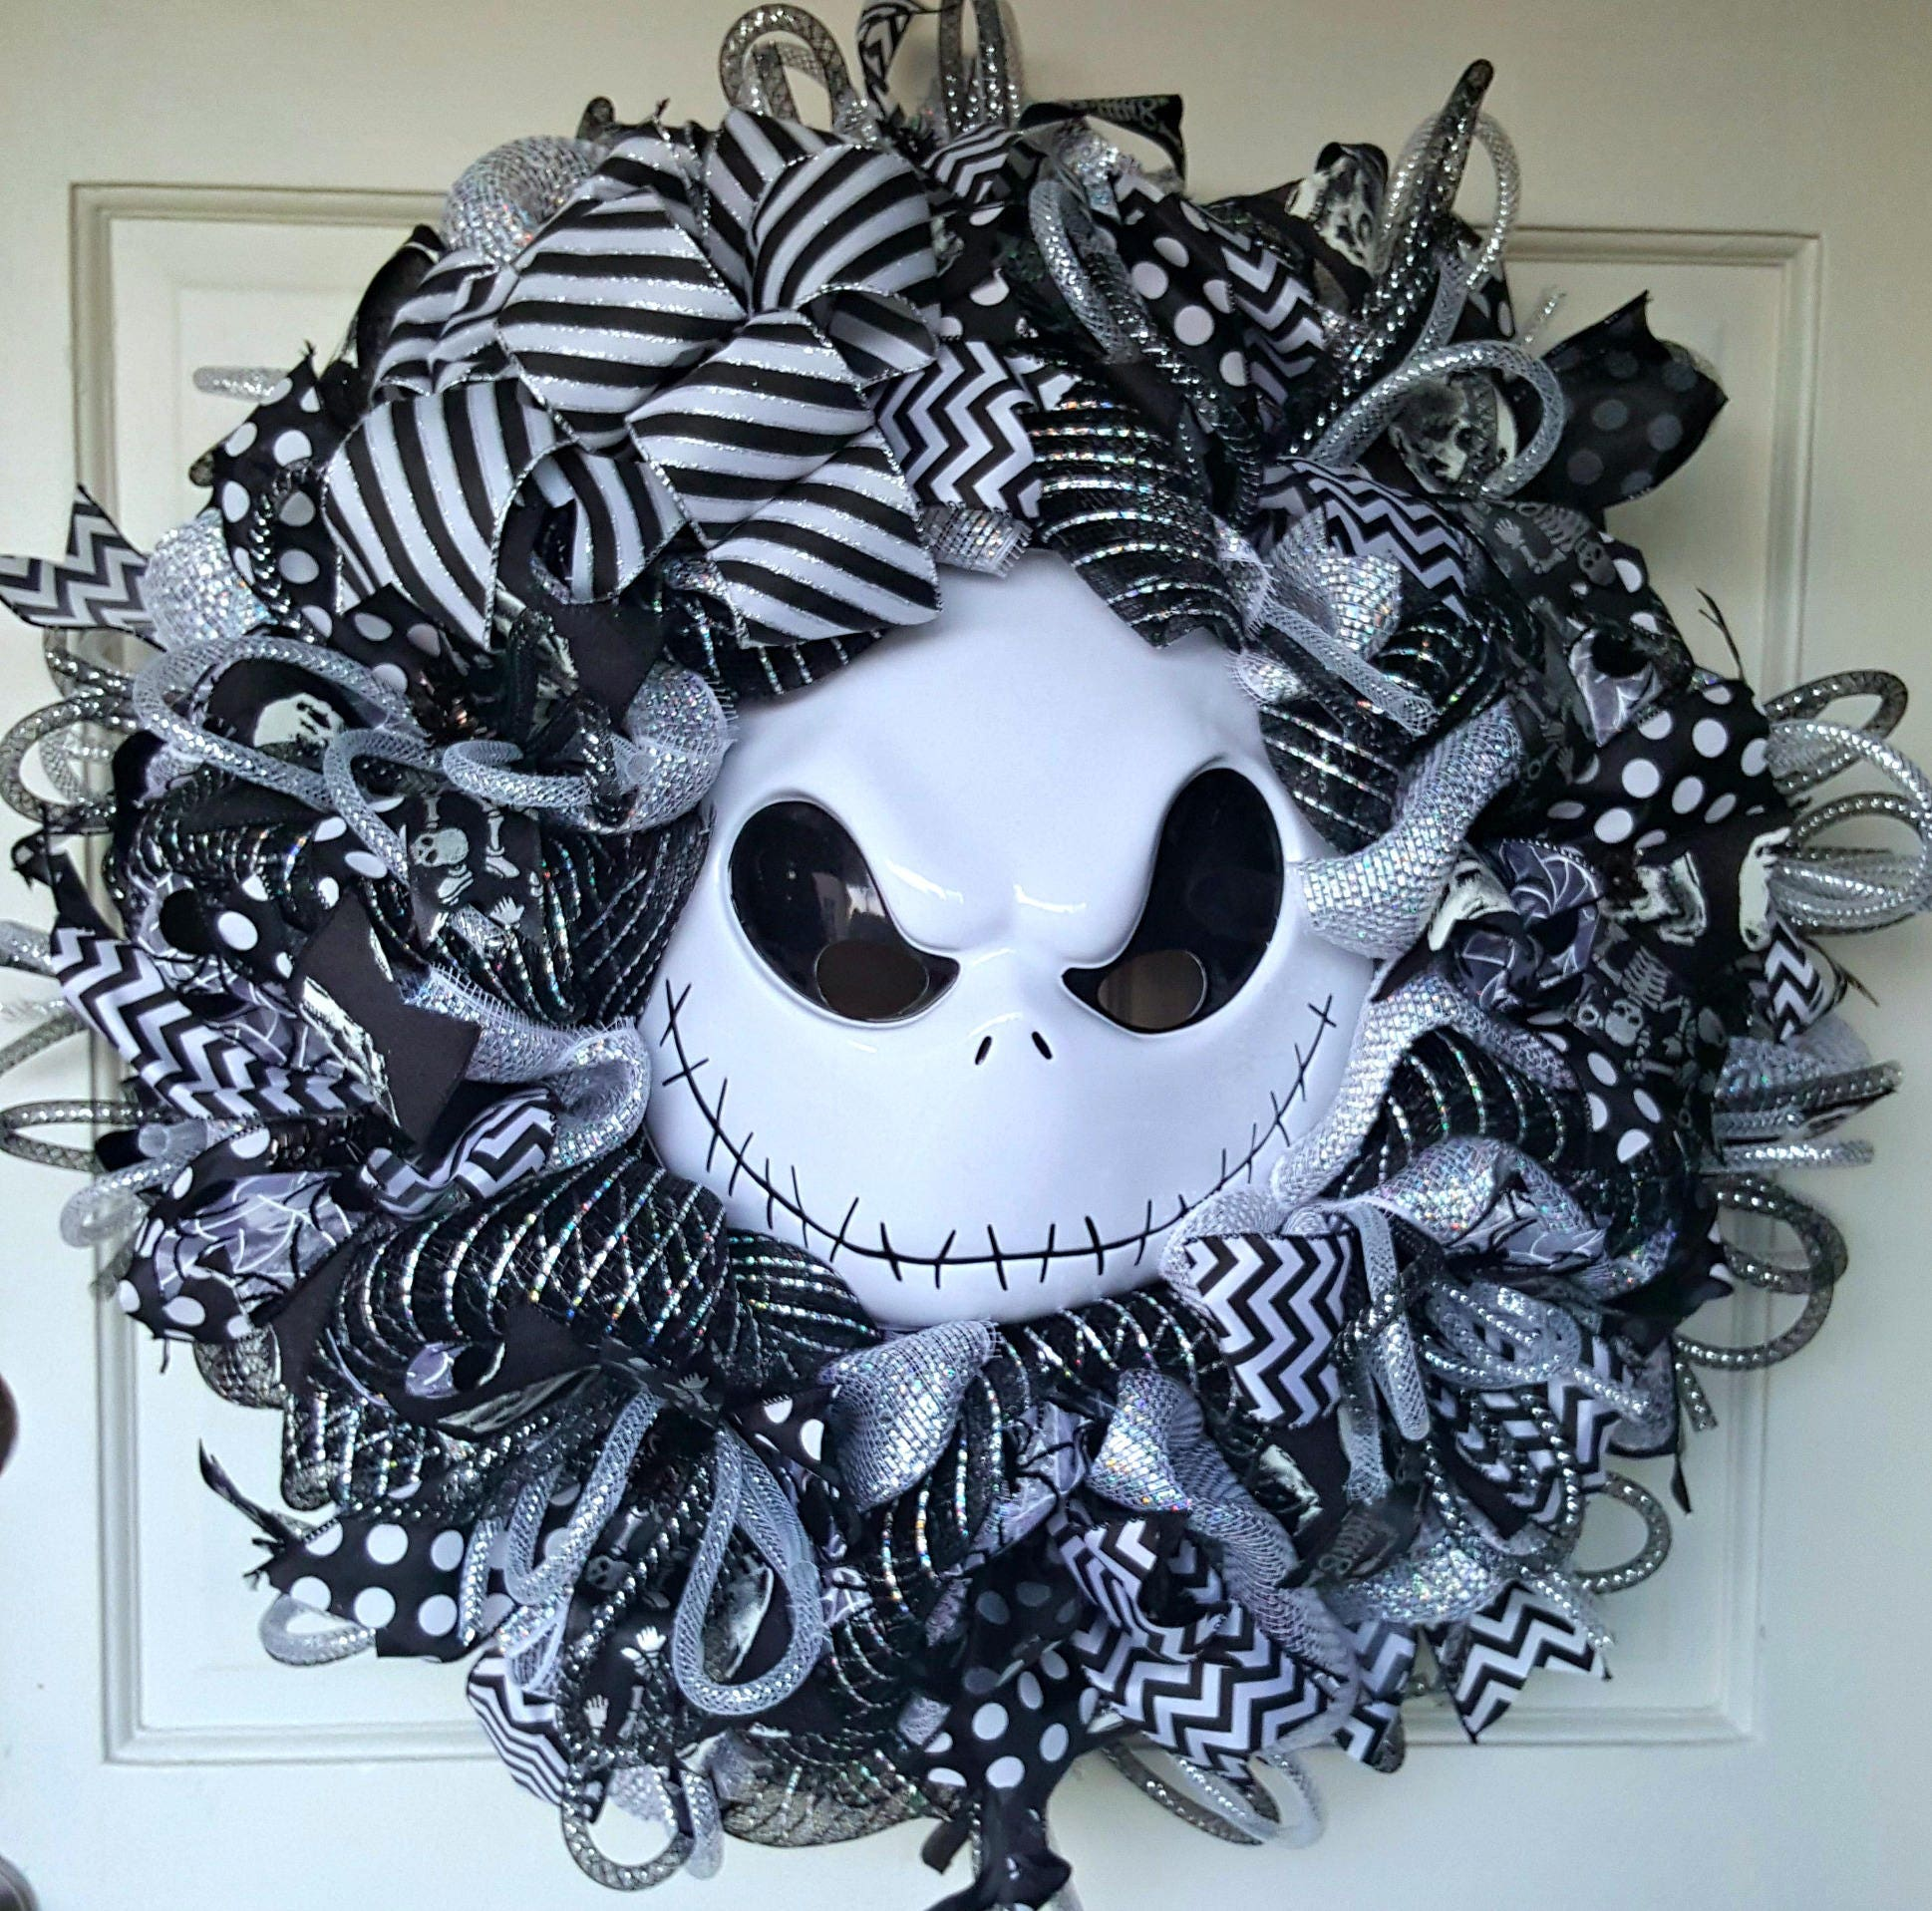 Nightmare before christmas halloween wreath jack skellington - Jack skellington christmas decorations ...